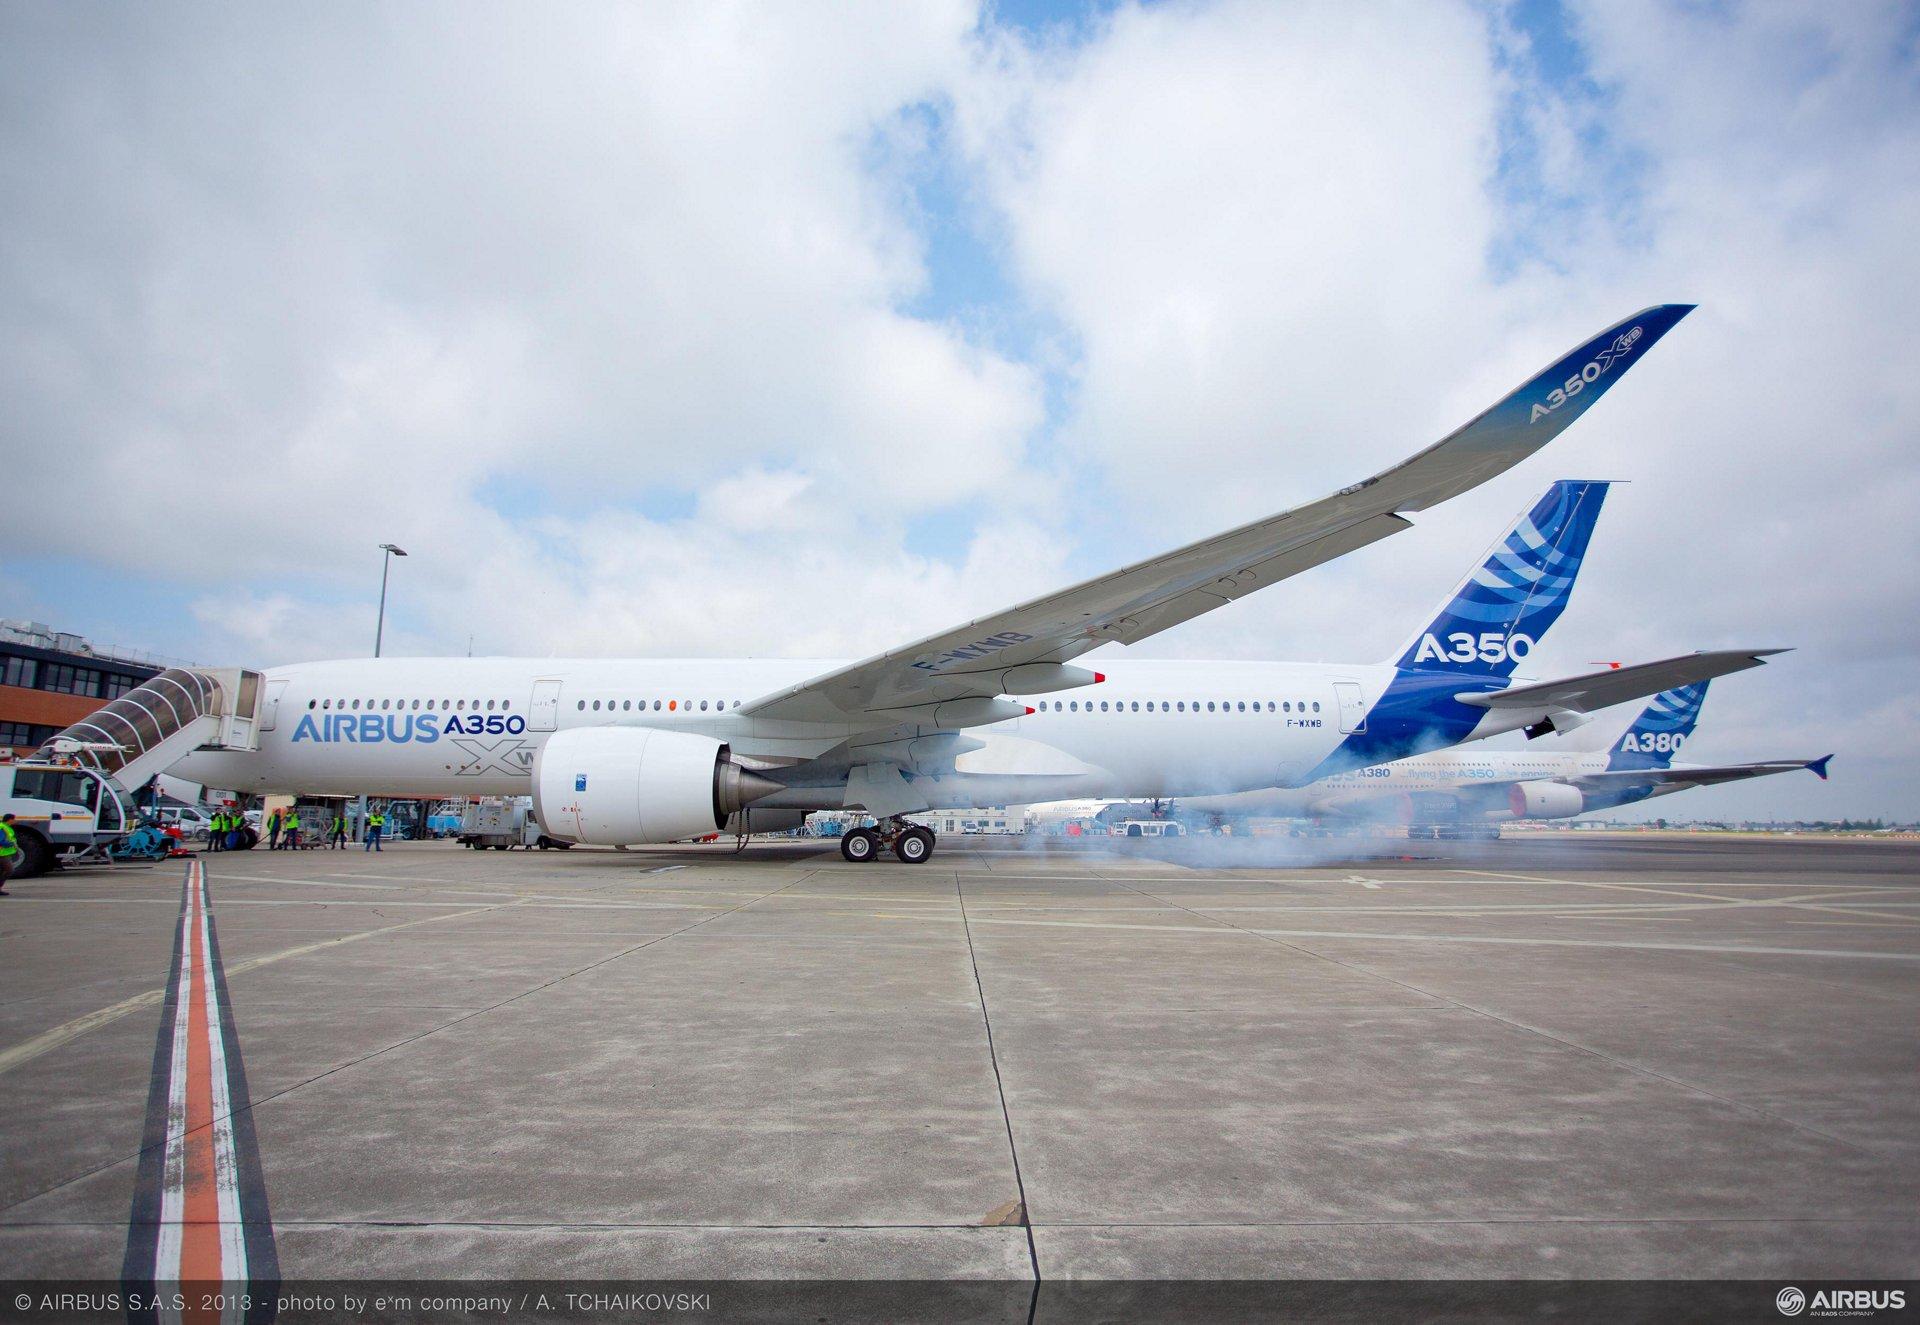 A350 XWB first engine run